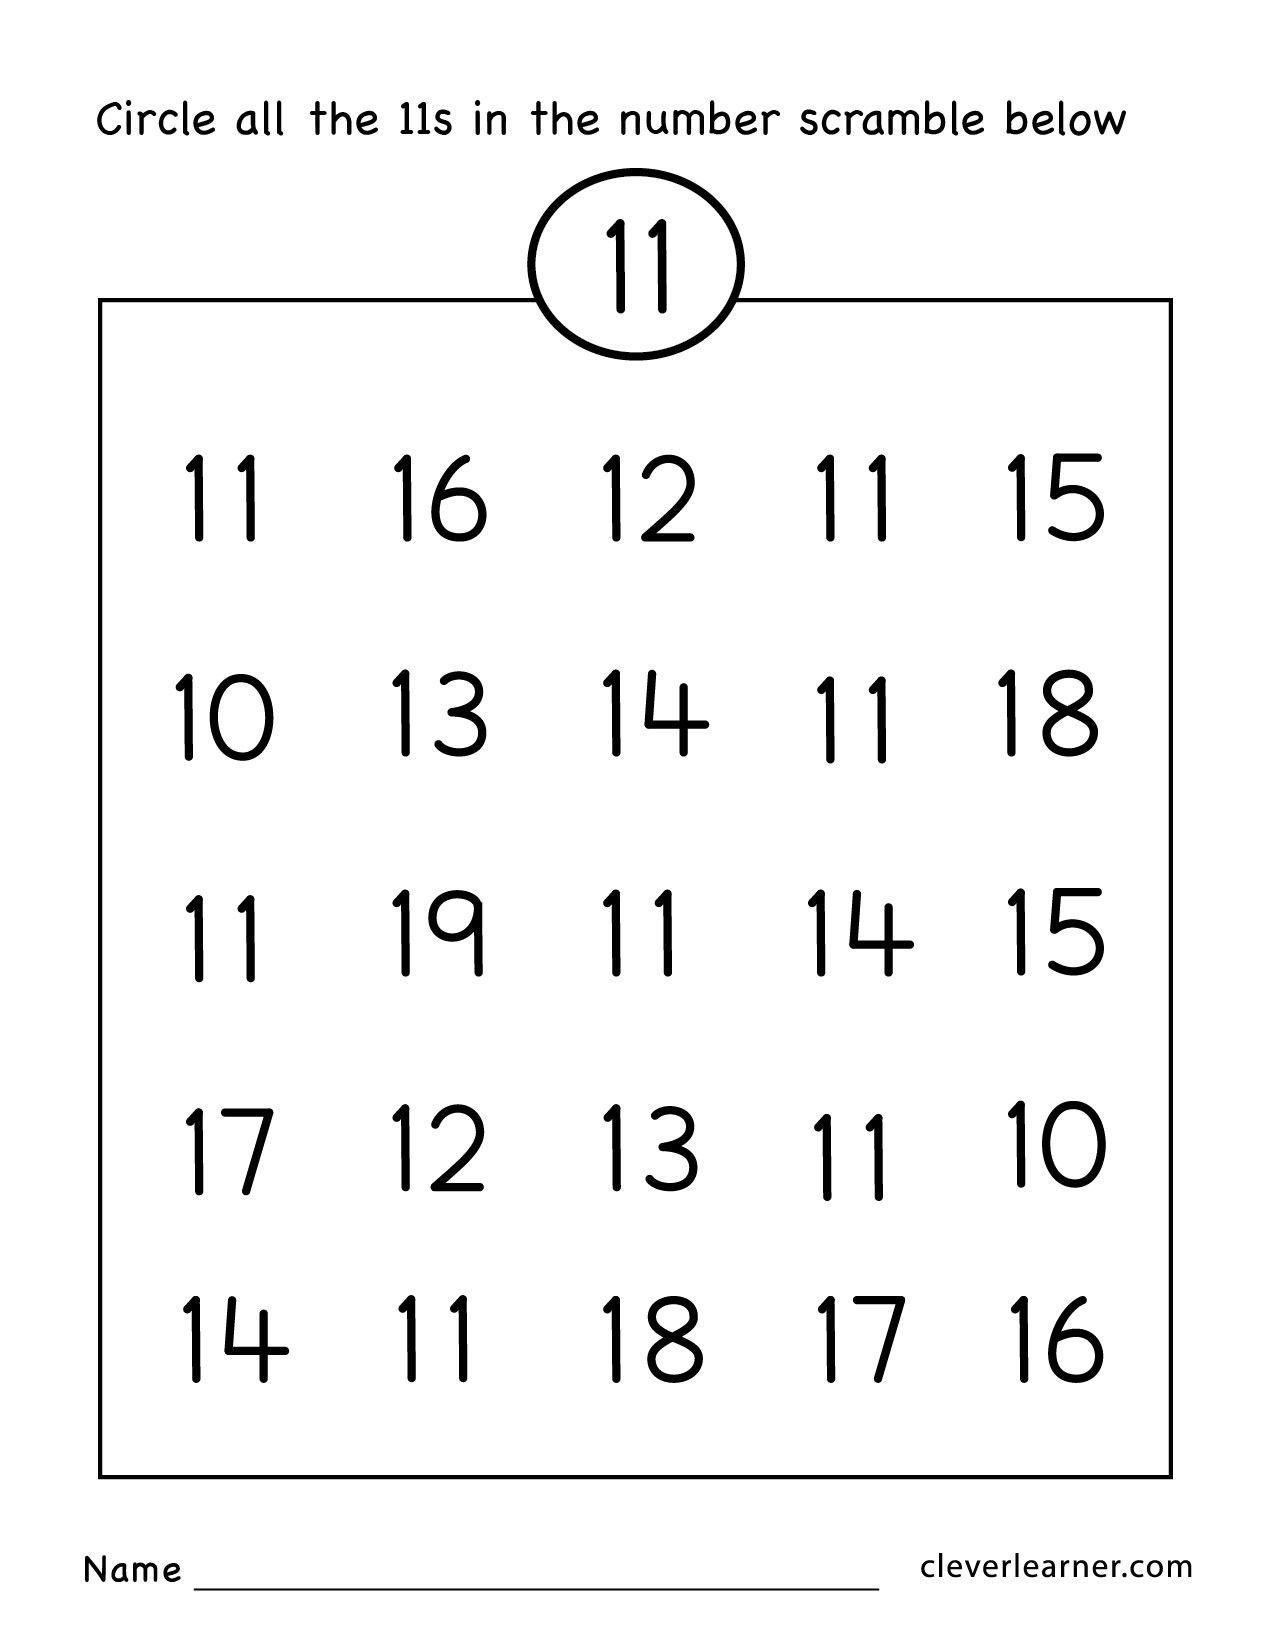 Ordinal Numbers Worksheets For Nursery Best Number Worksheet Math Workshe Ets 11 20 C Alfabe Calisma Sayfalari Okul Oncesi Calisma Cizelgeleri Okuma Calismasi [ 1650 x 1275 Pixel ]